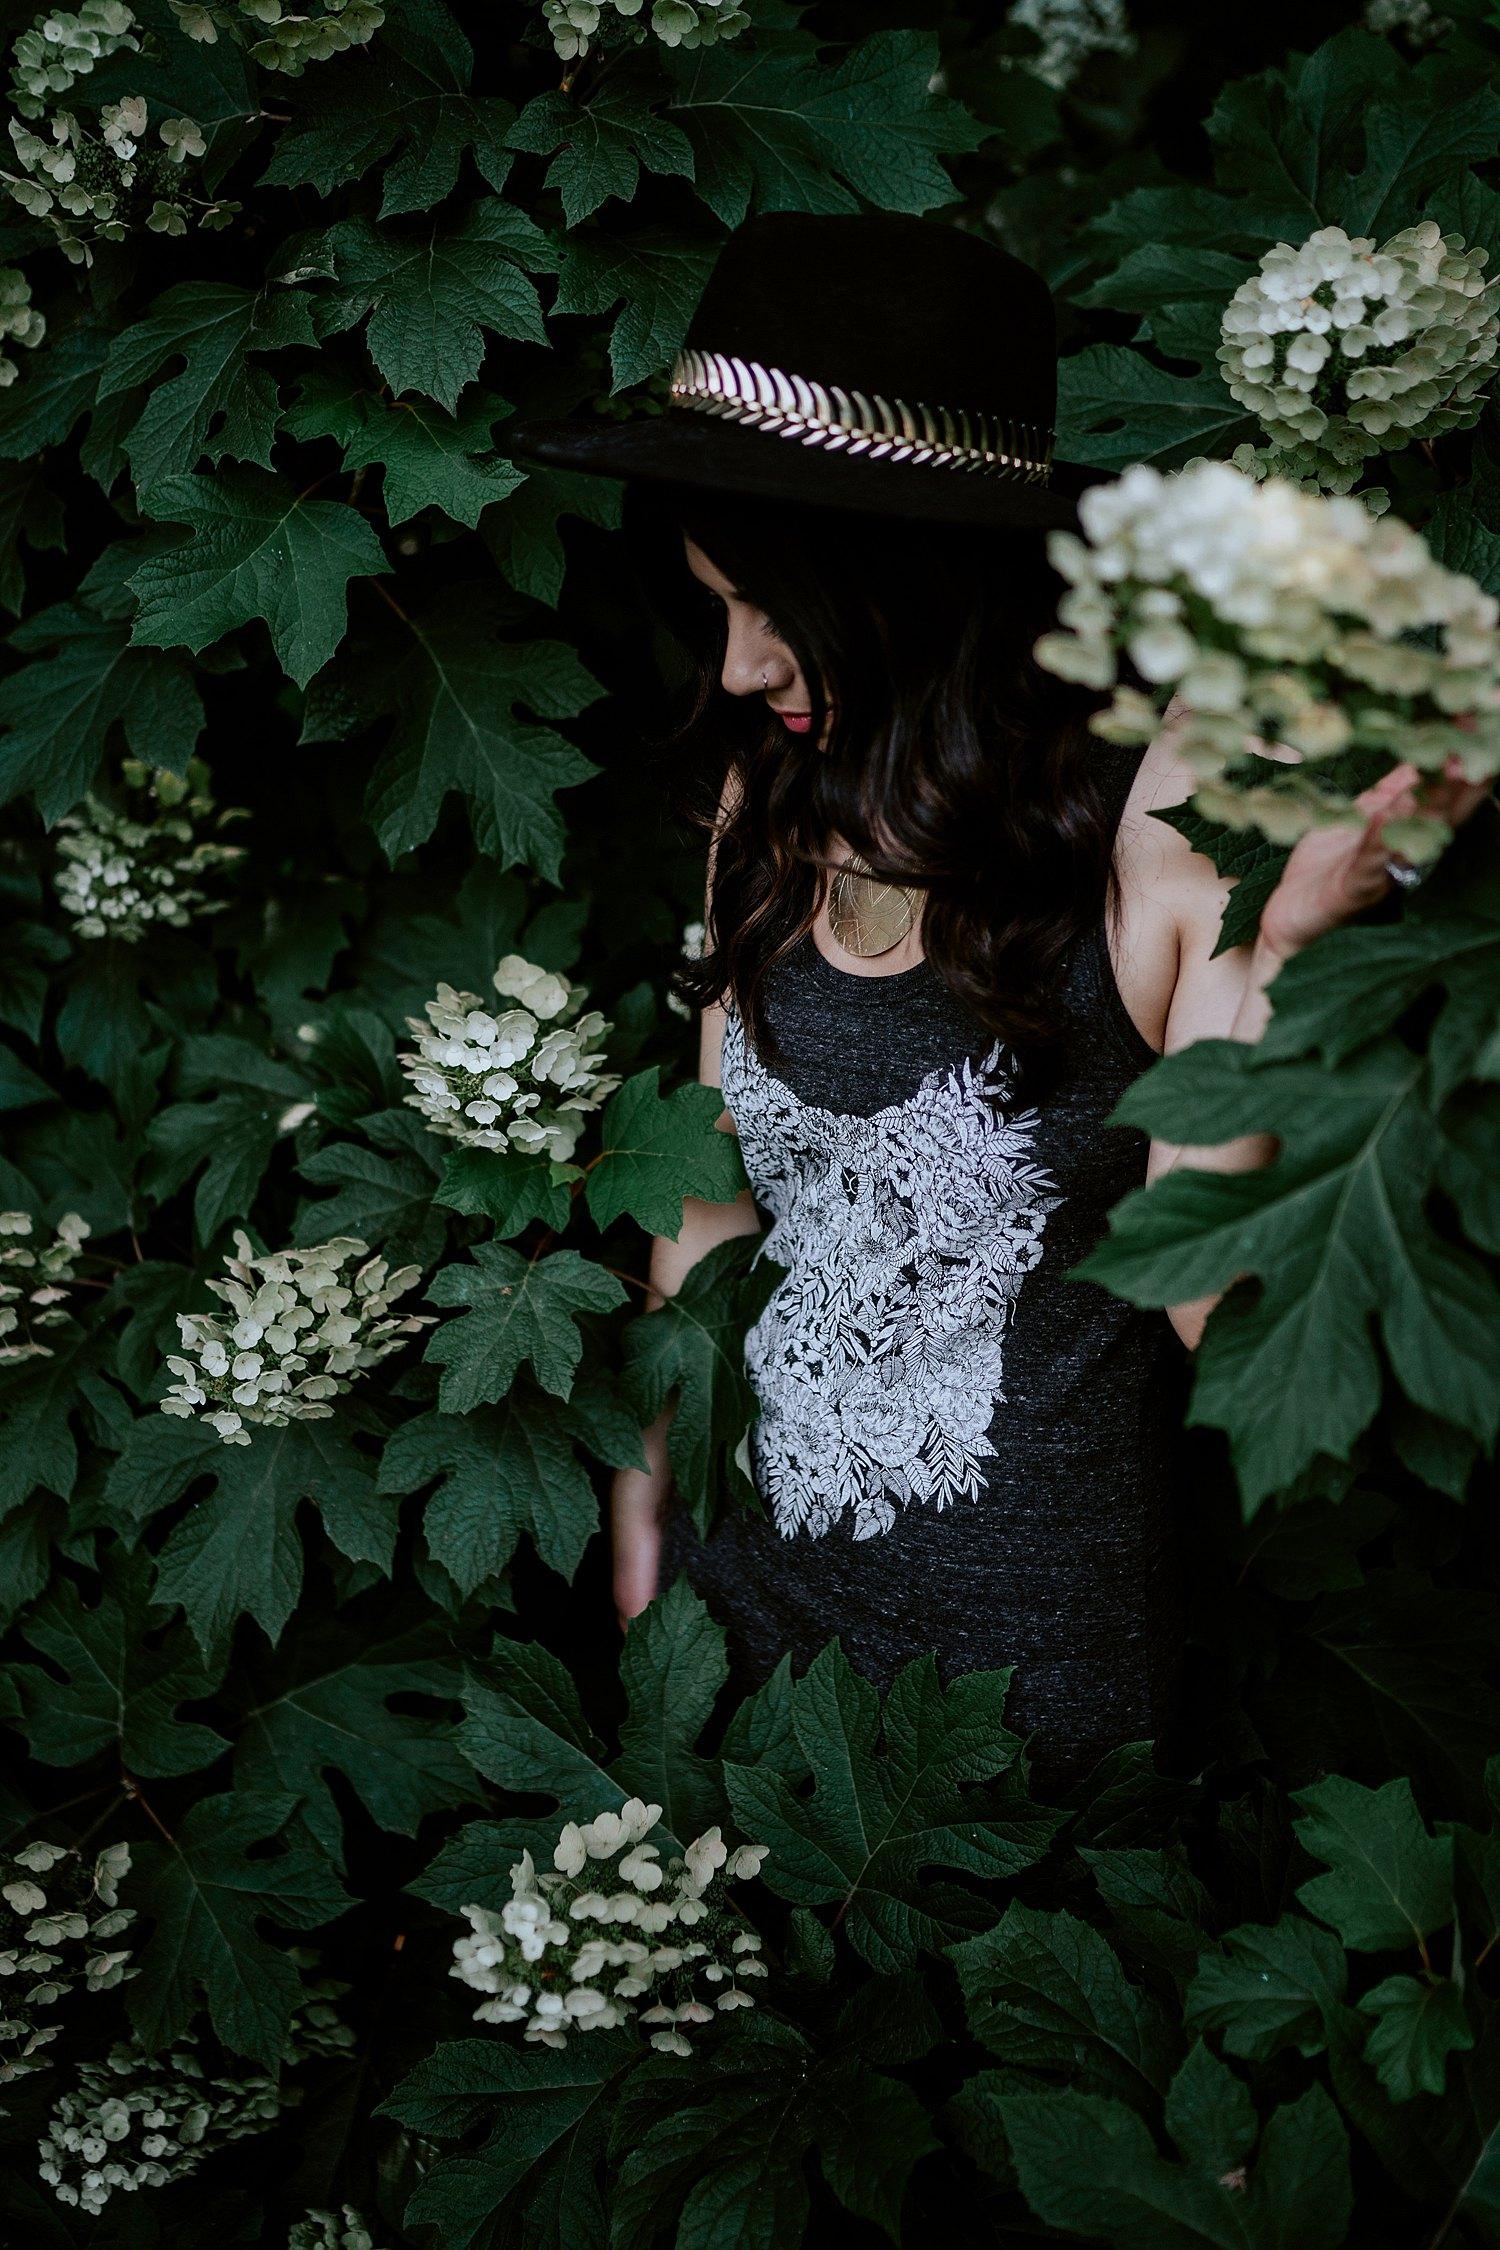 longwood-gardens--009.JPG